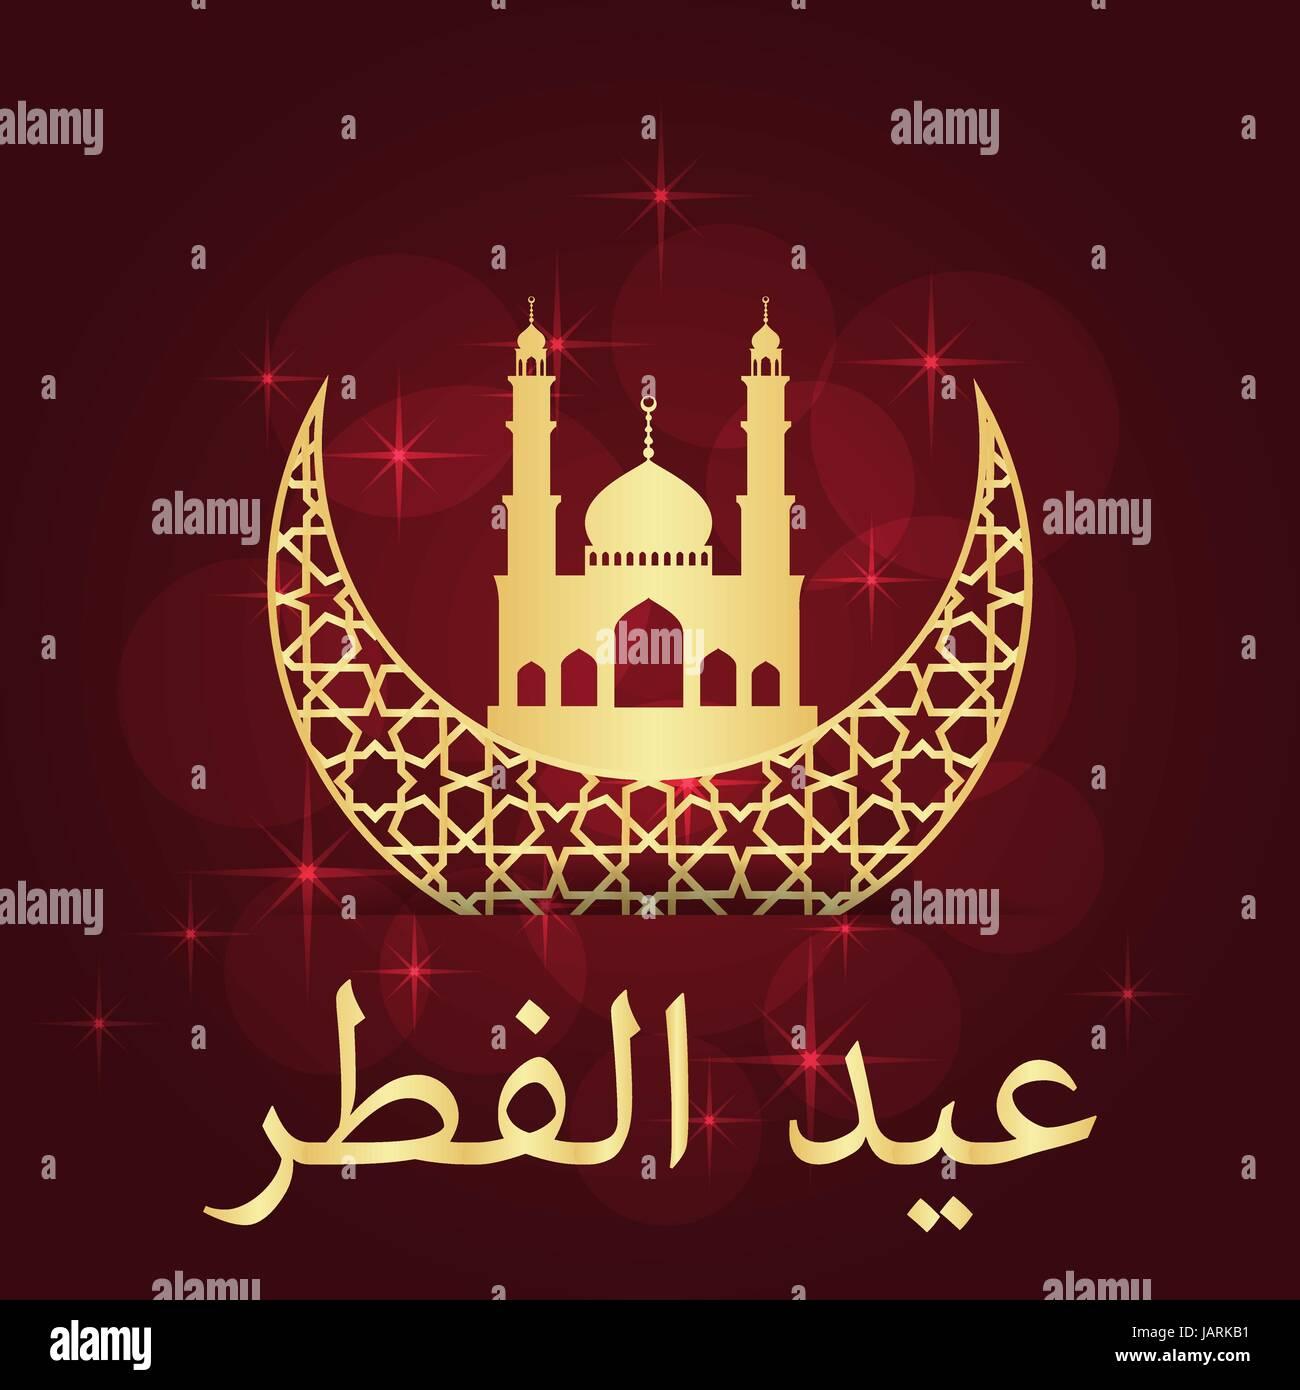 Amazing Official Eid Al-Fitr Greeting - eid-al-fitr-greeting-card-JARKB1  Picture_773286 .jpg